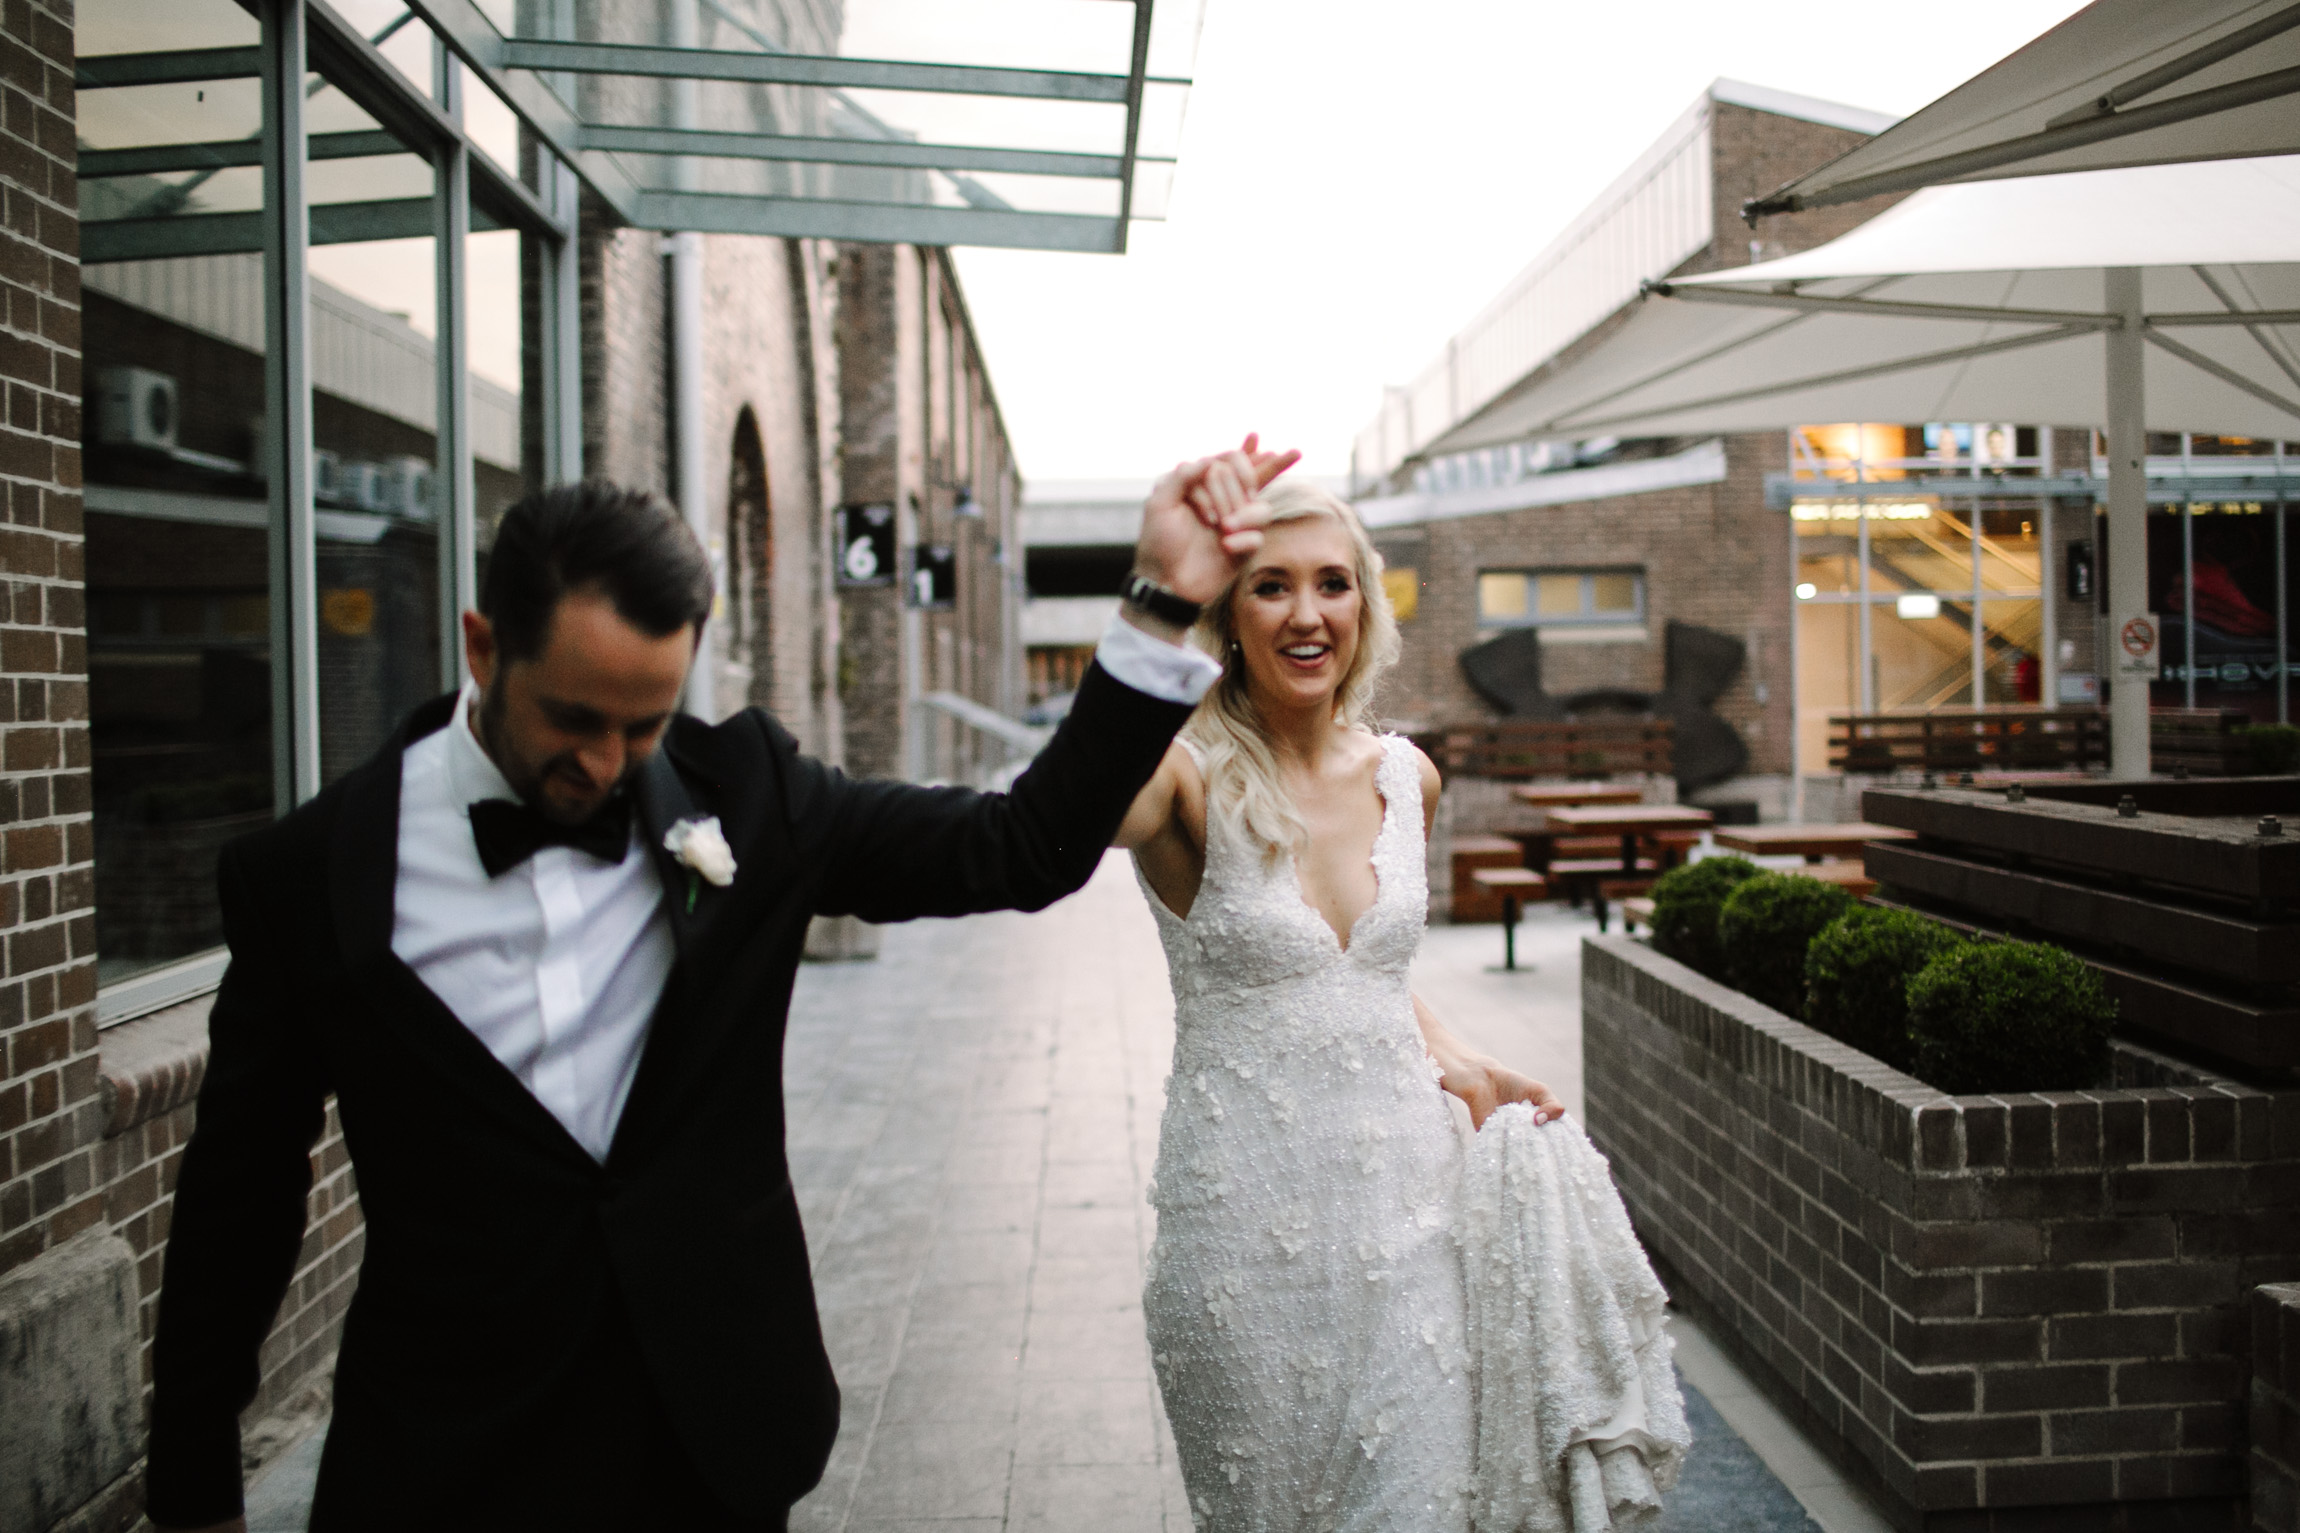 180223_justinaaron_wedding_charlotte_david_h-217.jpg